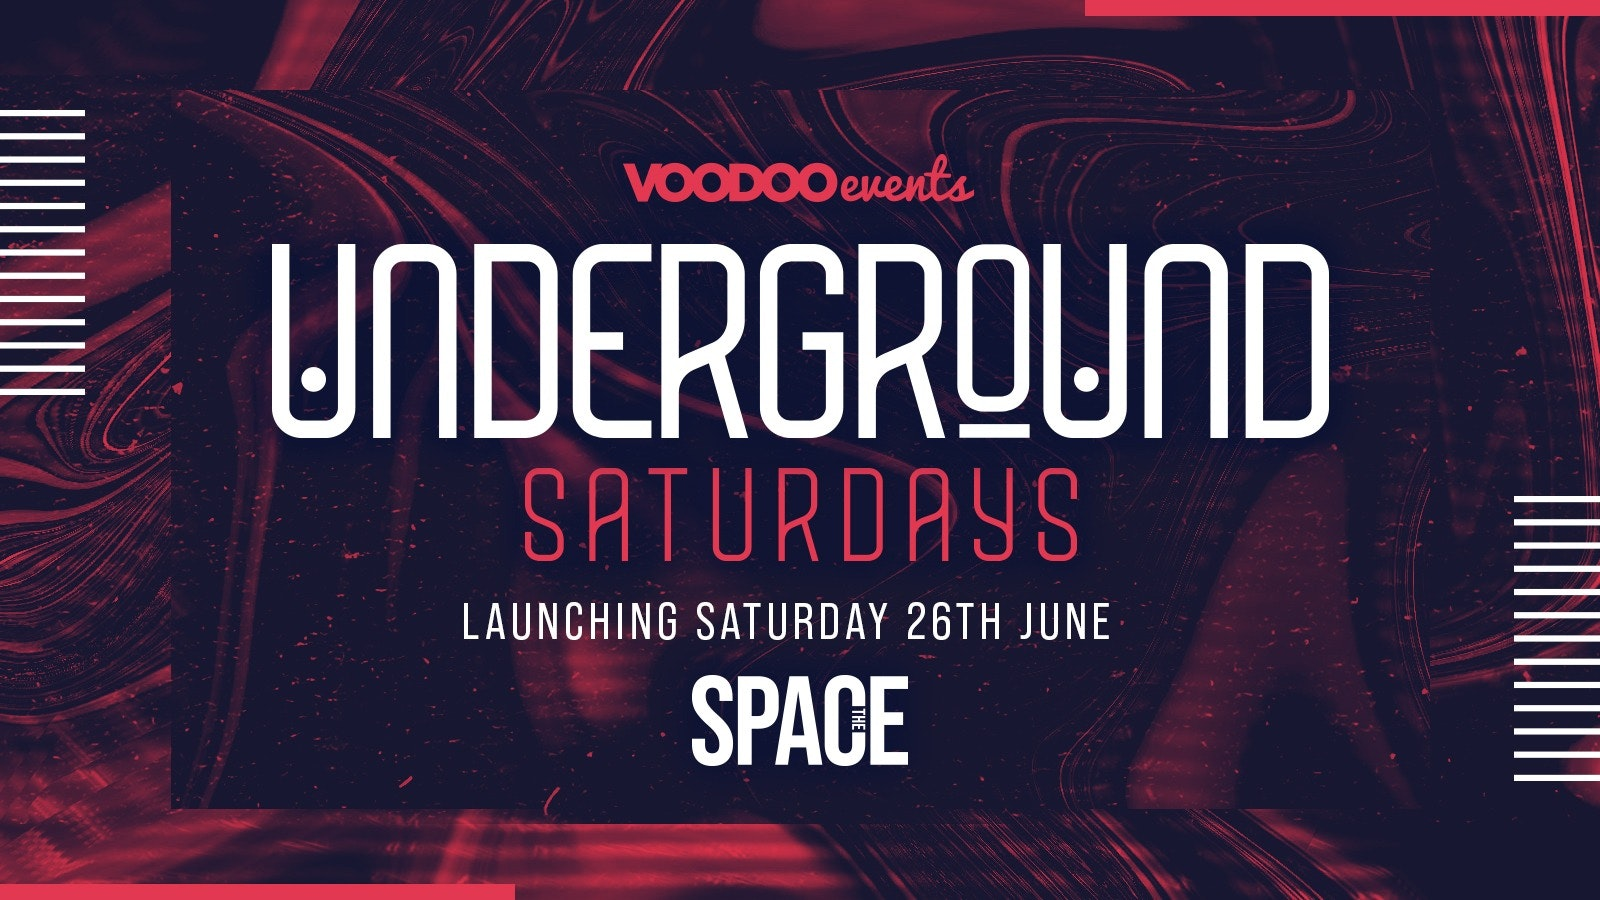 Underground Saturdays at Space – 3rd July